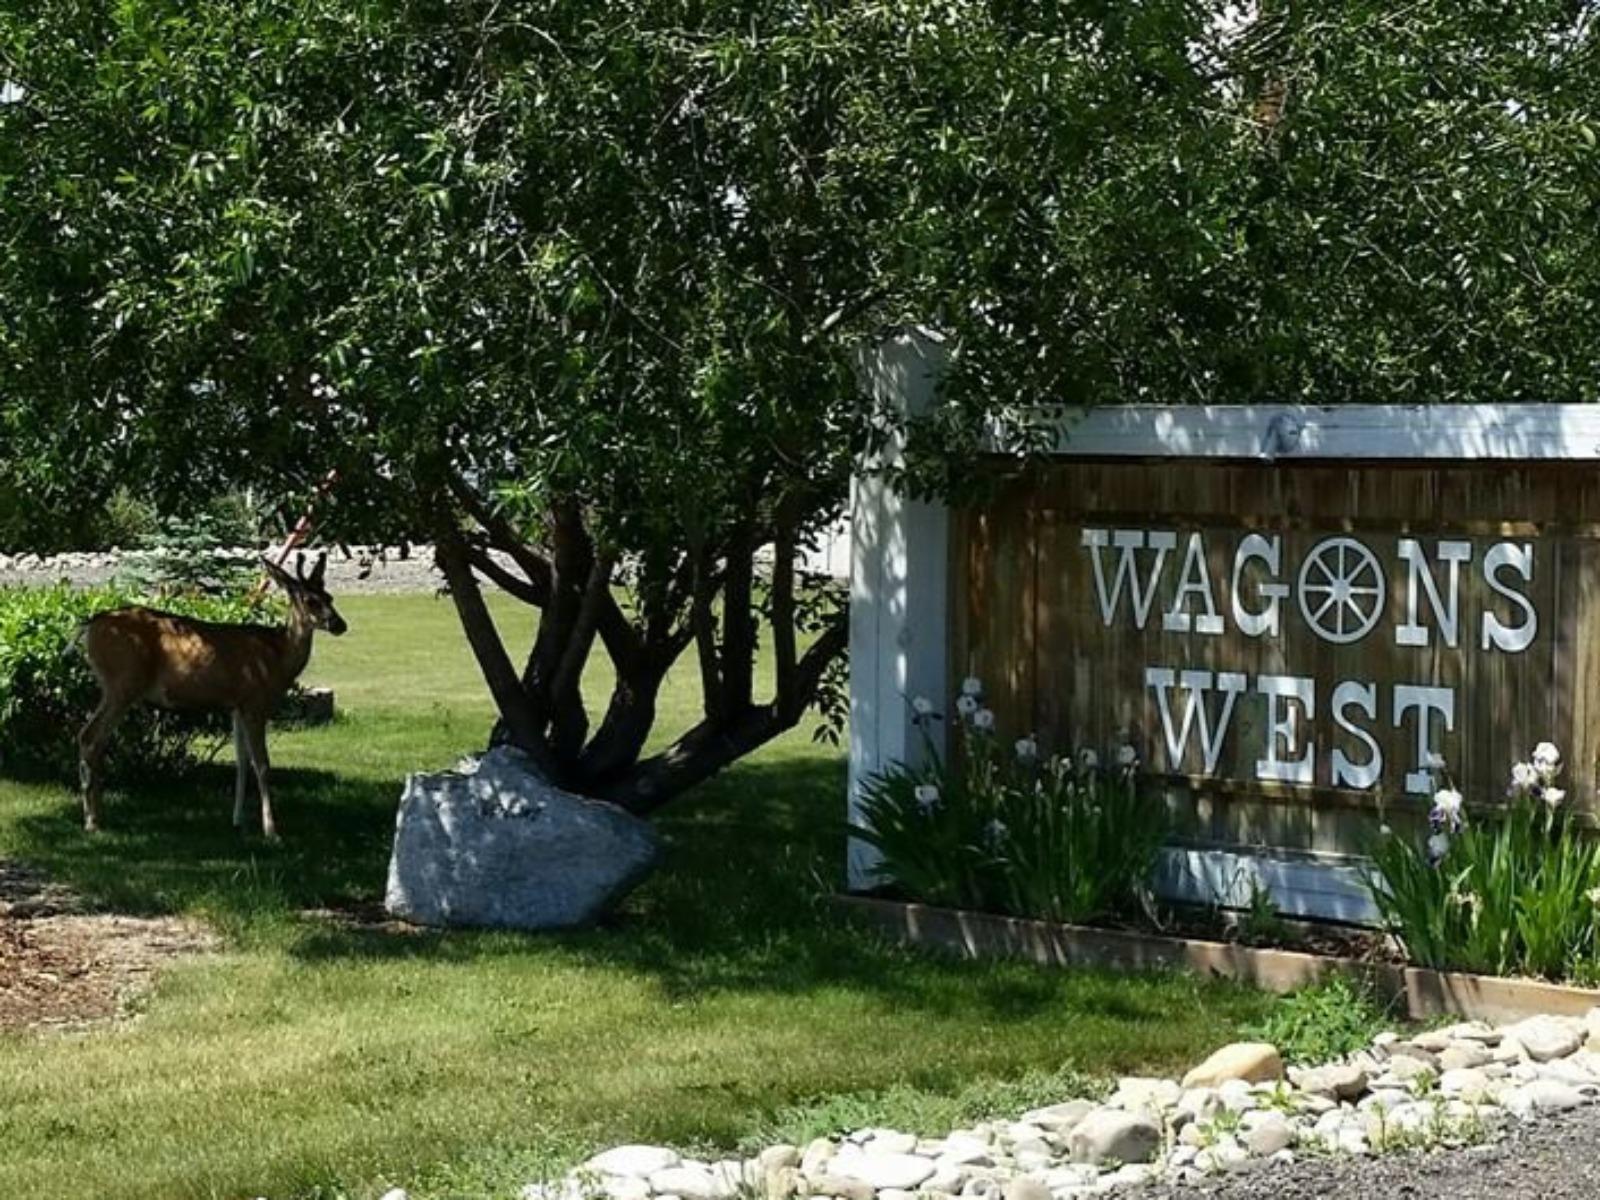 Wagons West RV Park